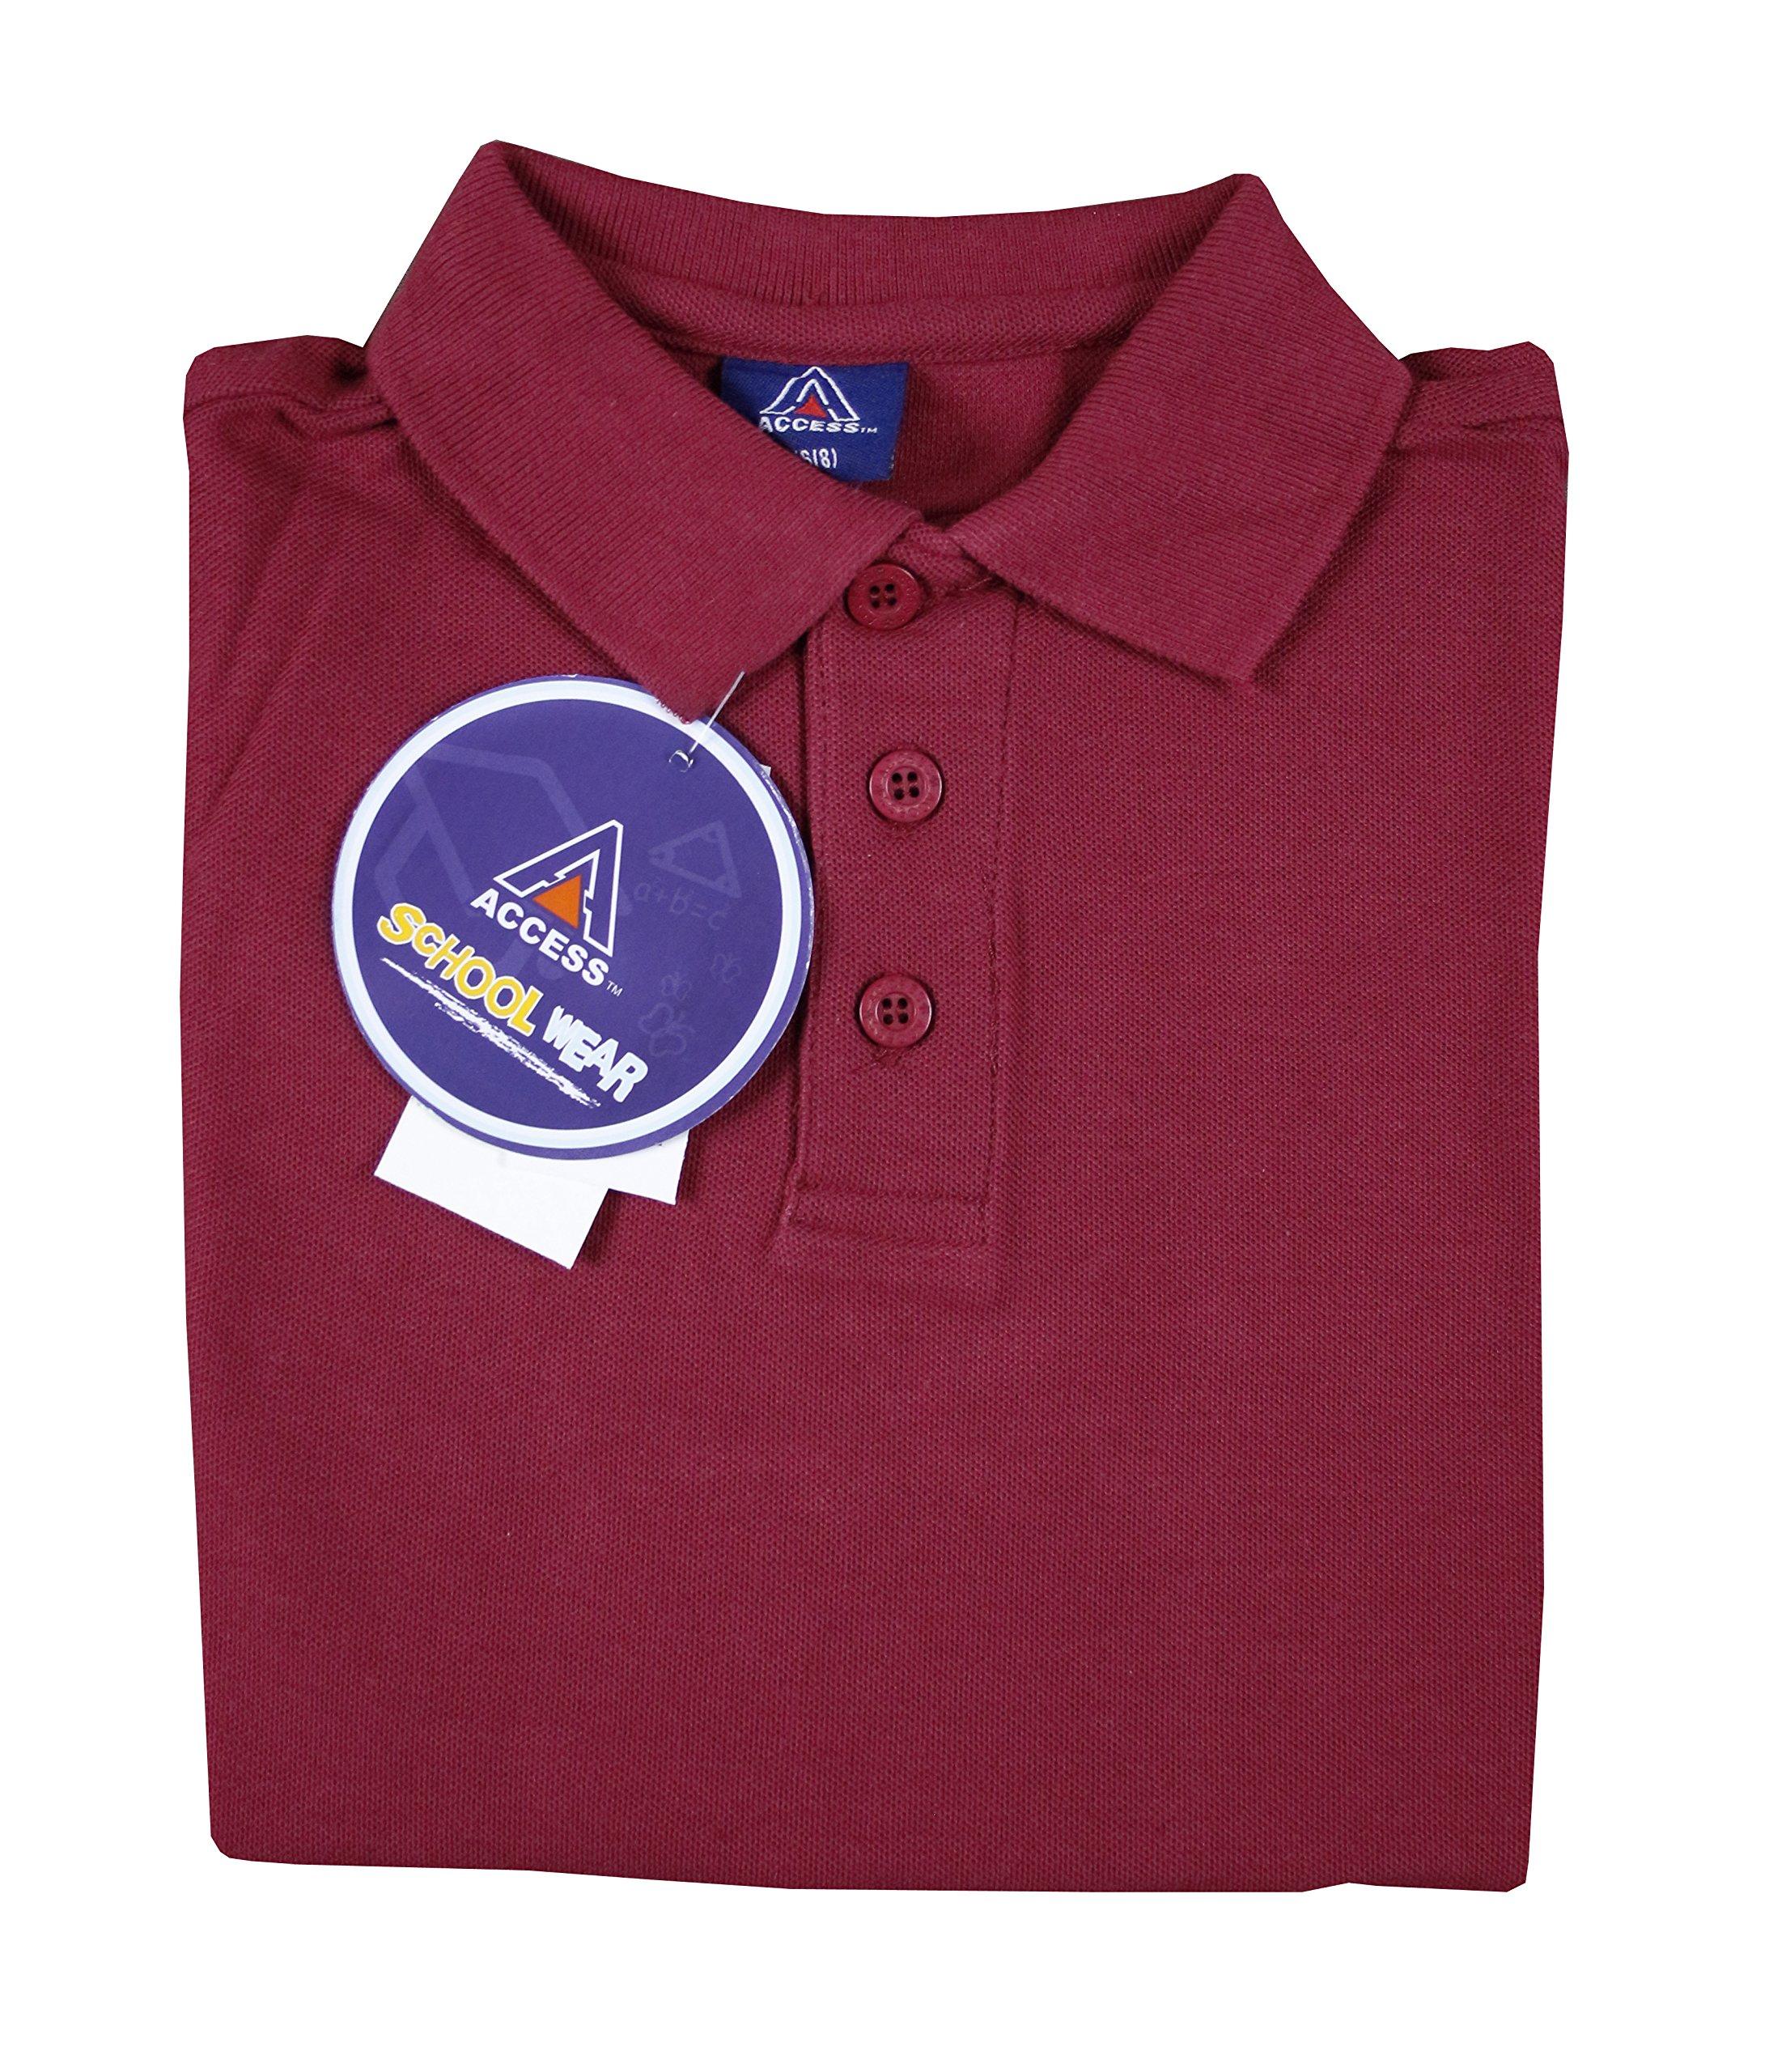 Access Unisex Kid's Short Sleeve School Uniform Pique Polo Burgundy M (10/12)